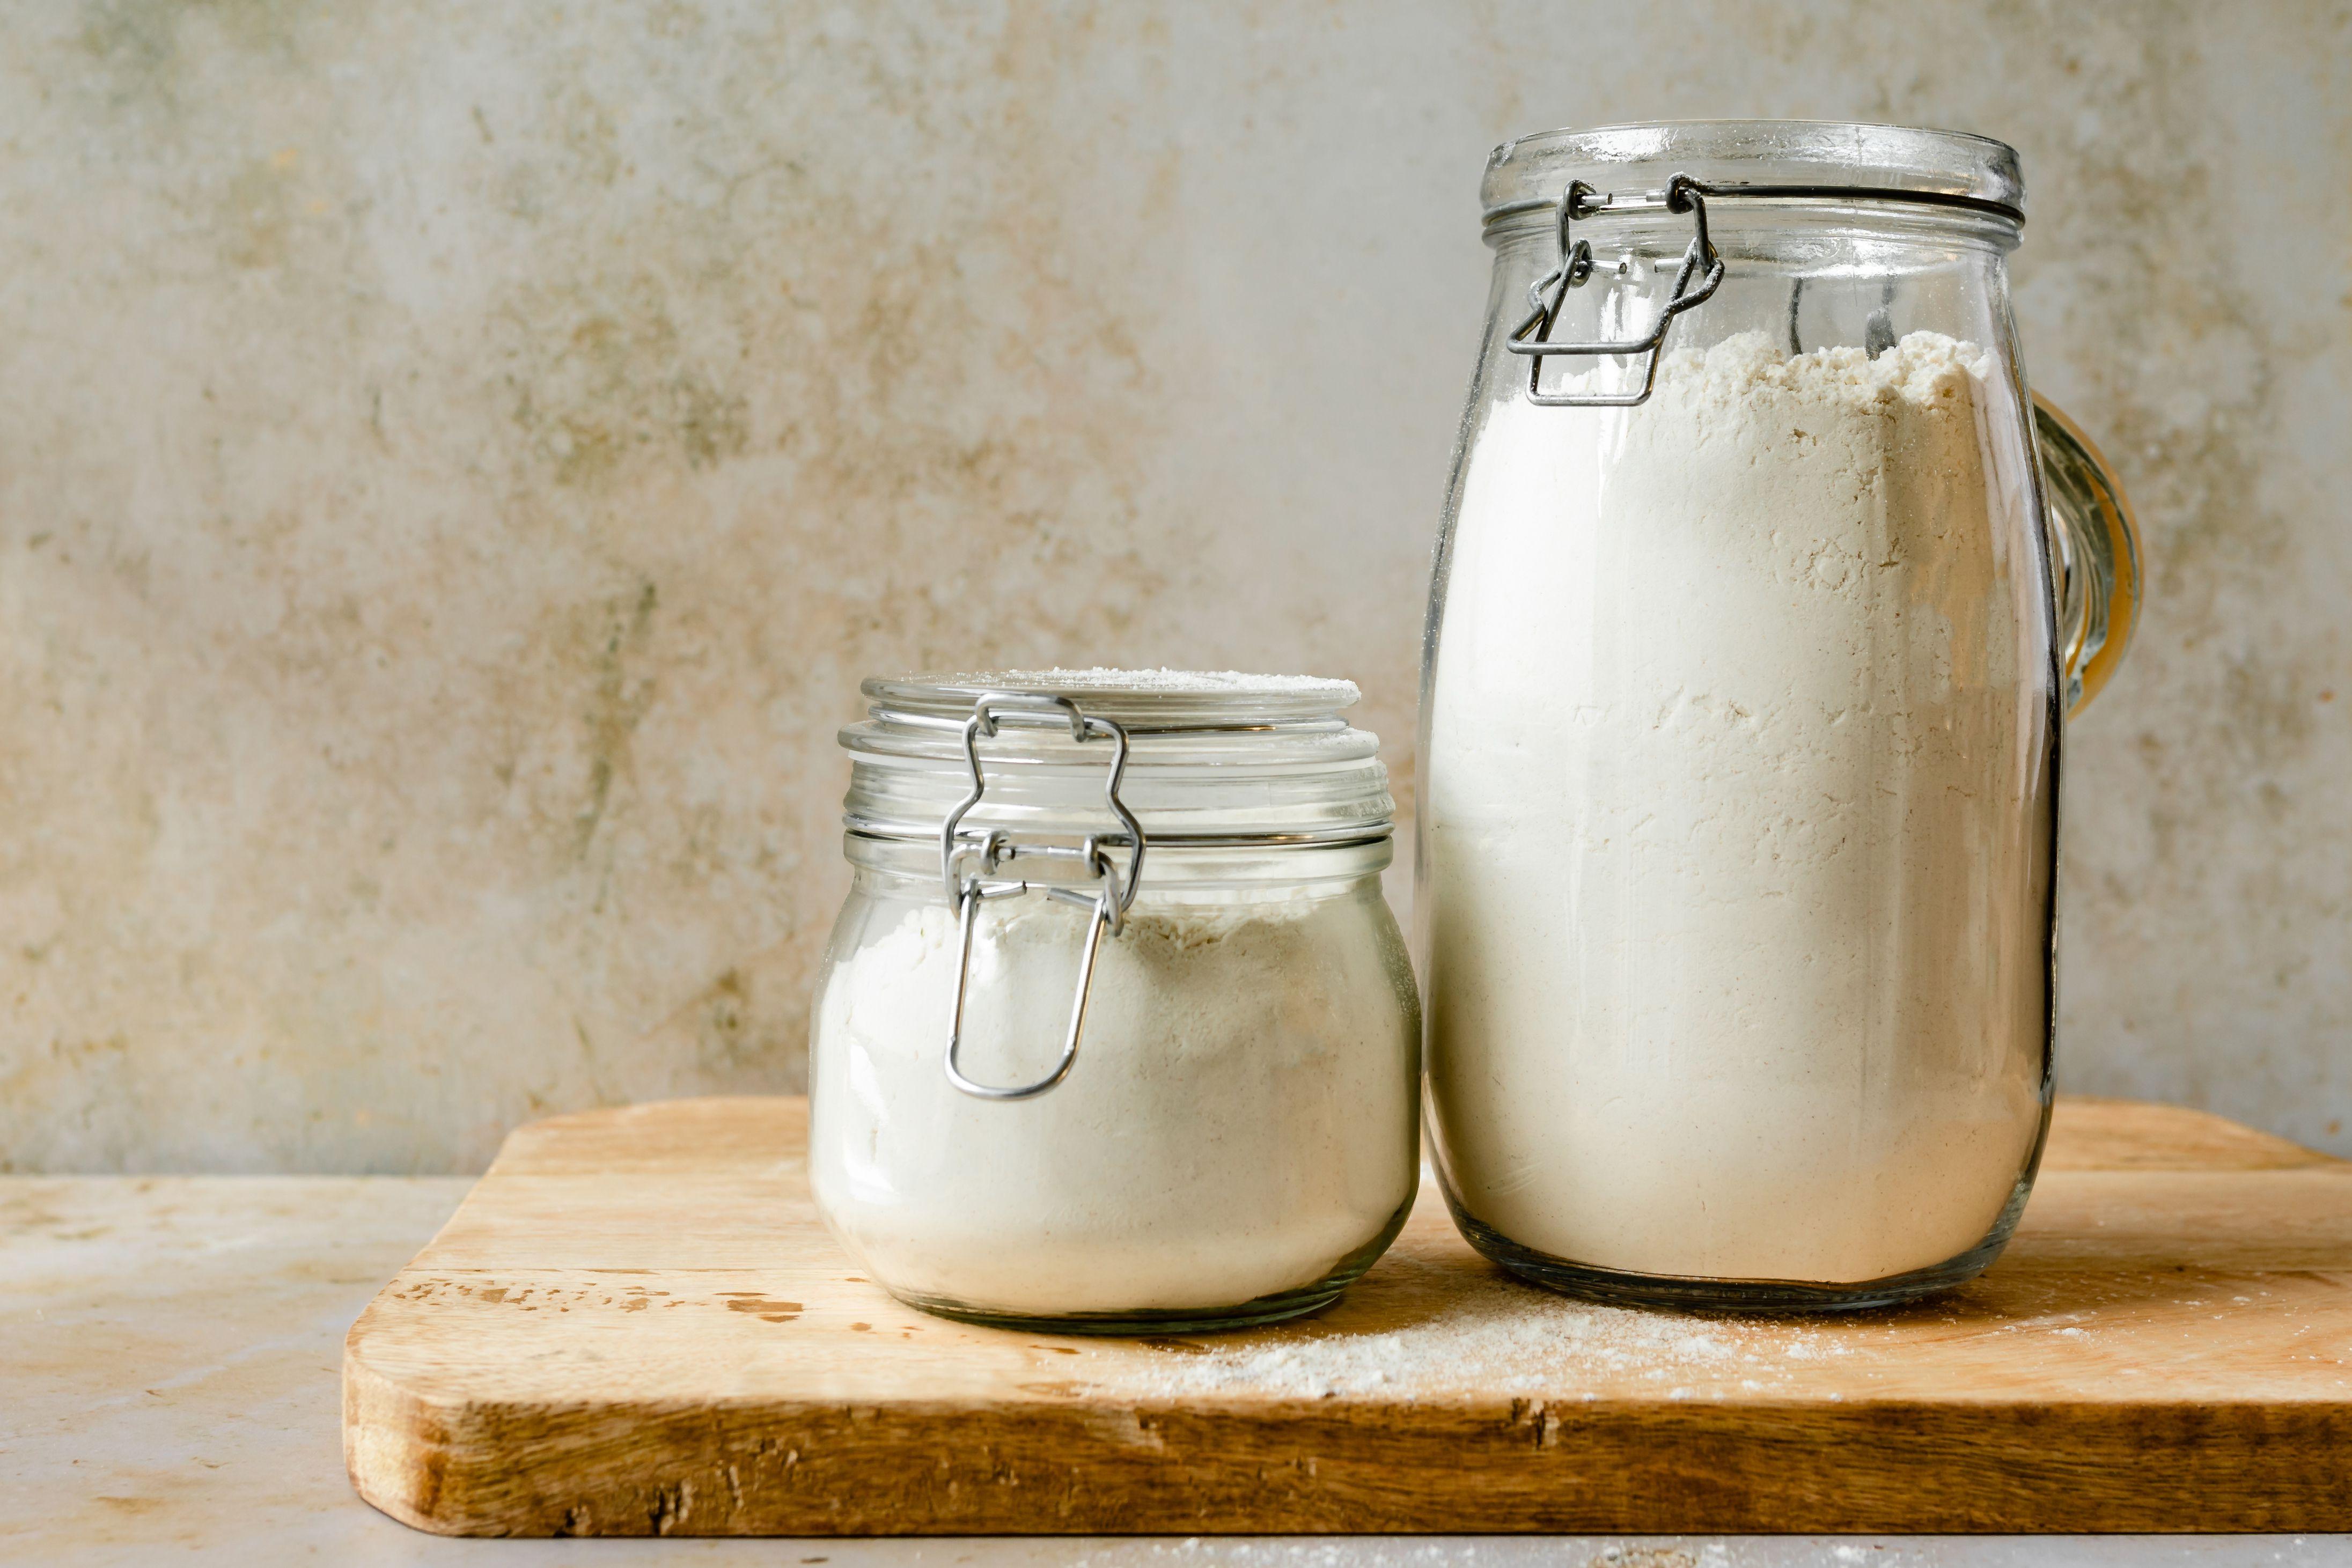 how-to-store-flour-1389337-hero-012-8b29c6c9cfad439c8db7965370c3b41e